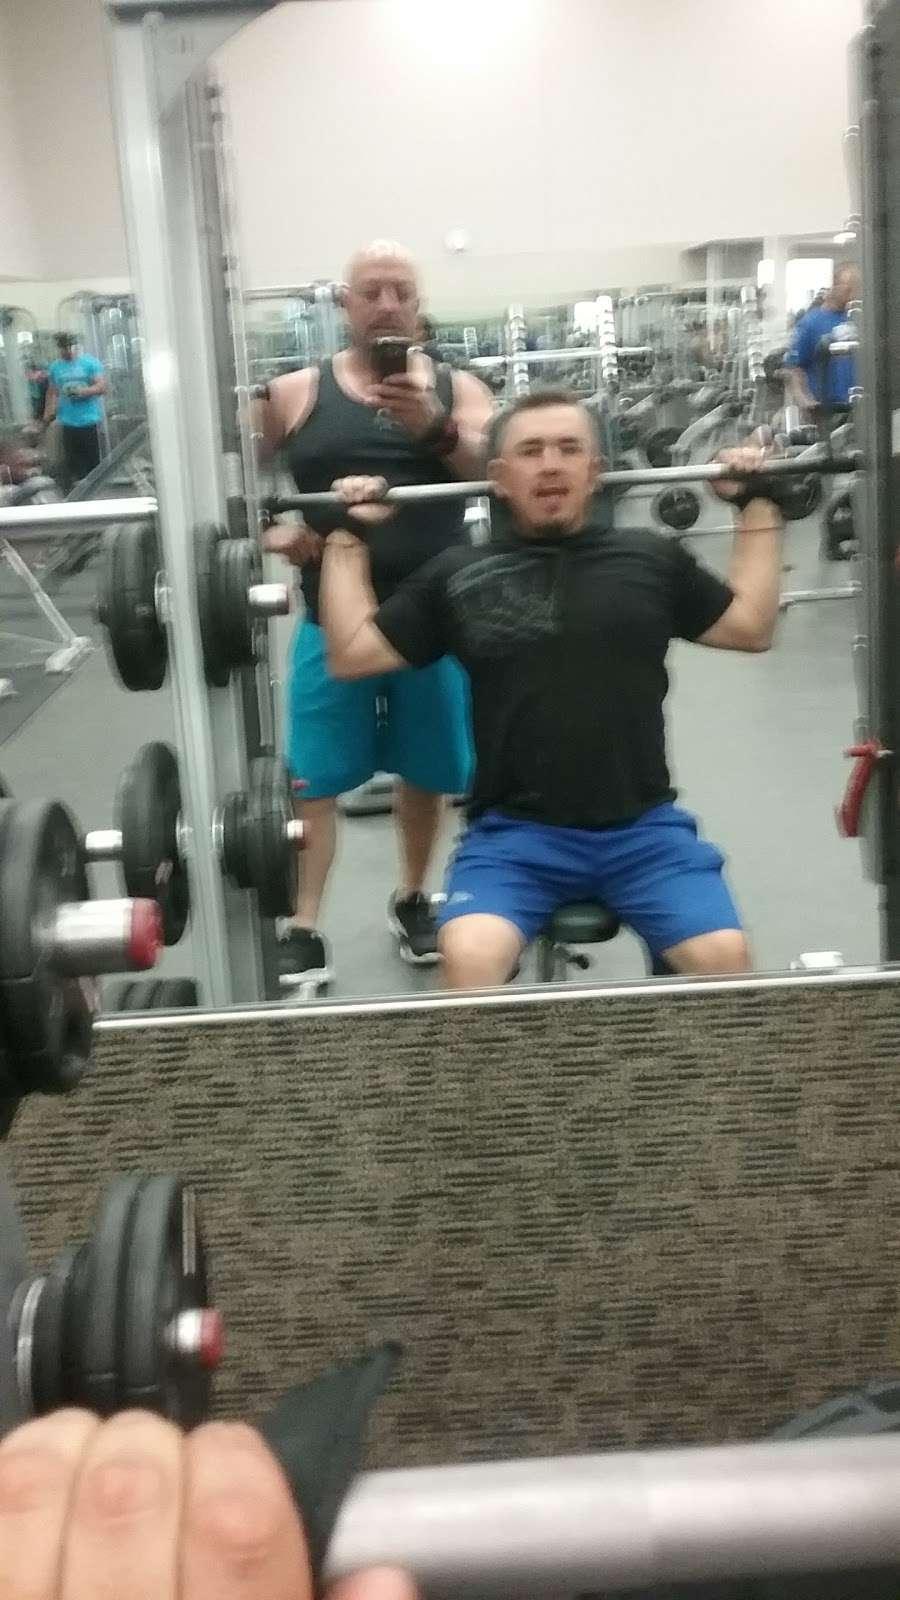 LA Fitness - gym  | Photo 9 of 10 | Address: 452 Lakehurst Rd, Waukegan, IL 60085, USA | Phone: (224) 399-0990